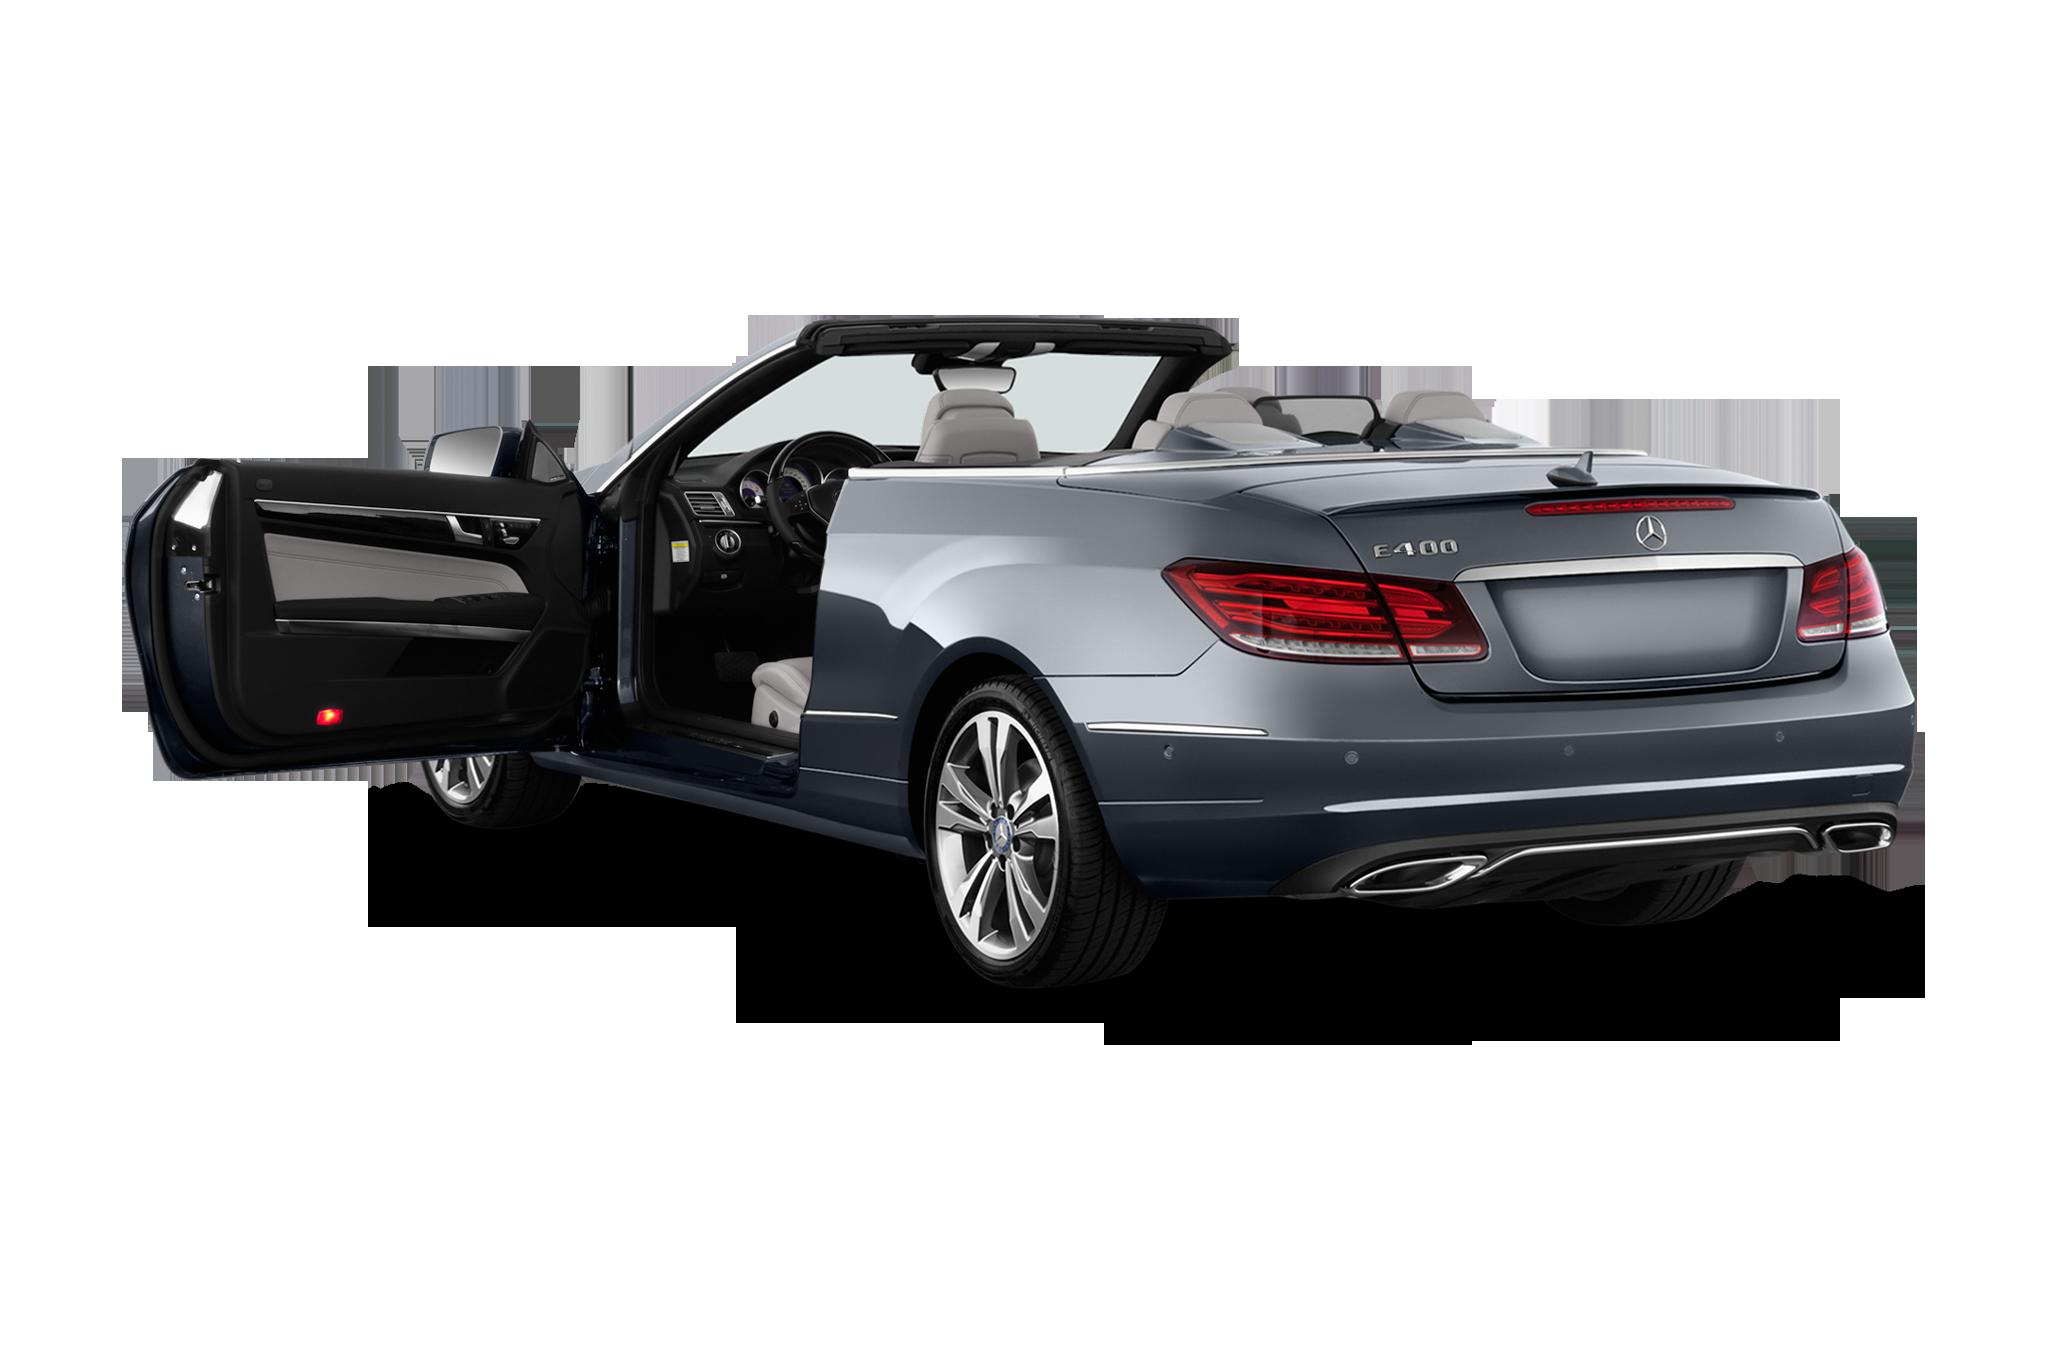 2017 mercedes e 400 2017 2018 best cars reviews. Black Bedroom Furniture Sets. Home Design Ideas